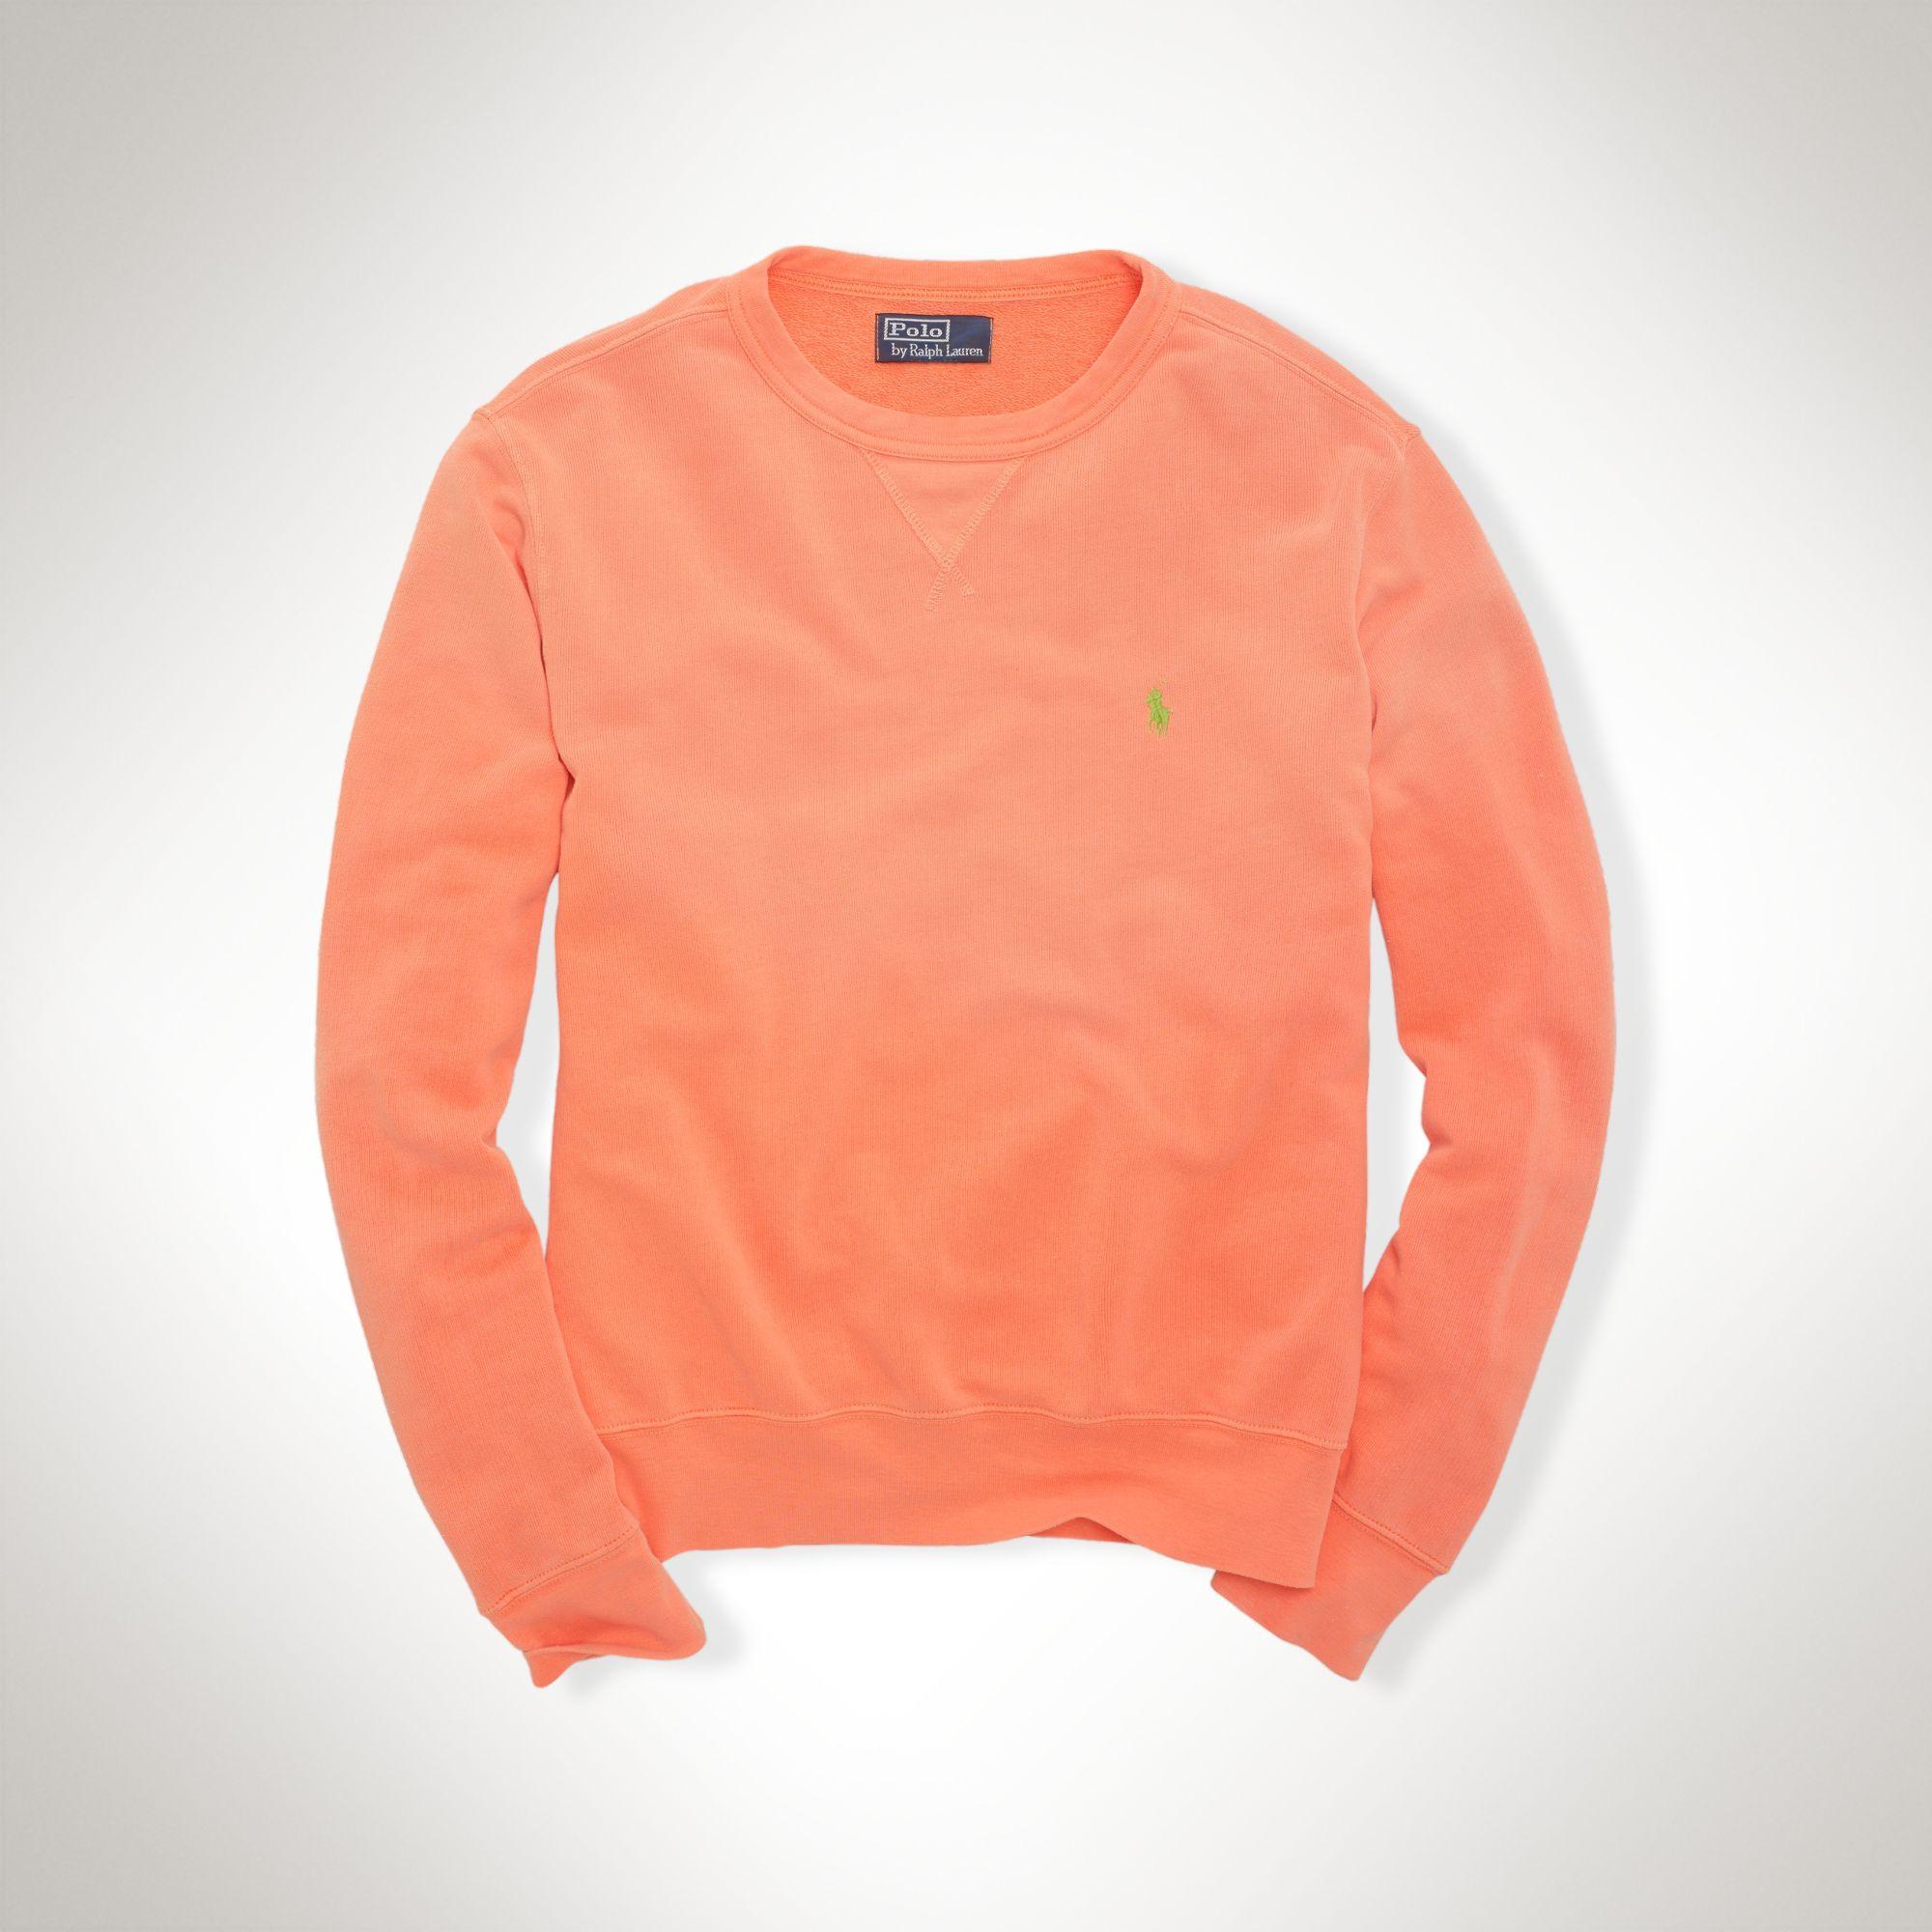 3f33a7bc4 ... clearance polo ralph lauren atlantic terry crew sweatshirt in orange  for men 7ec47 14c27